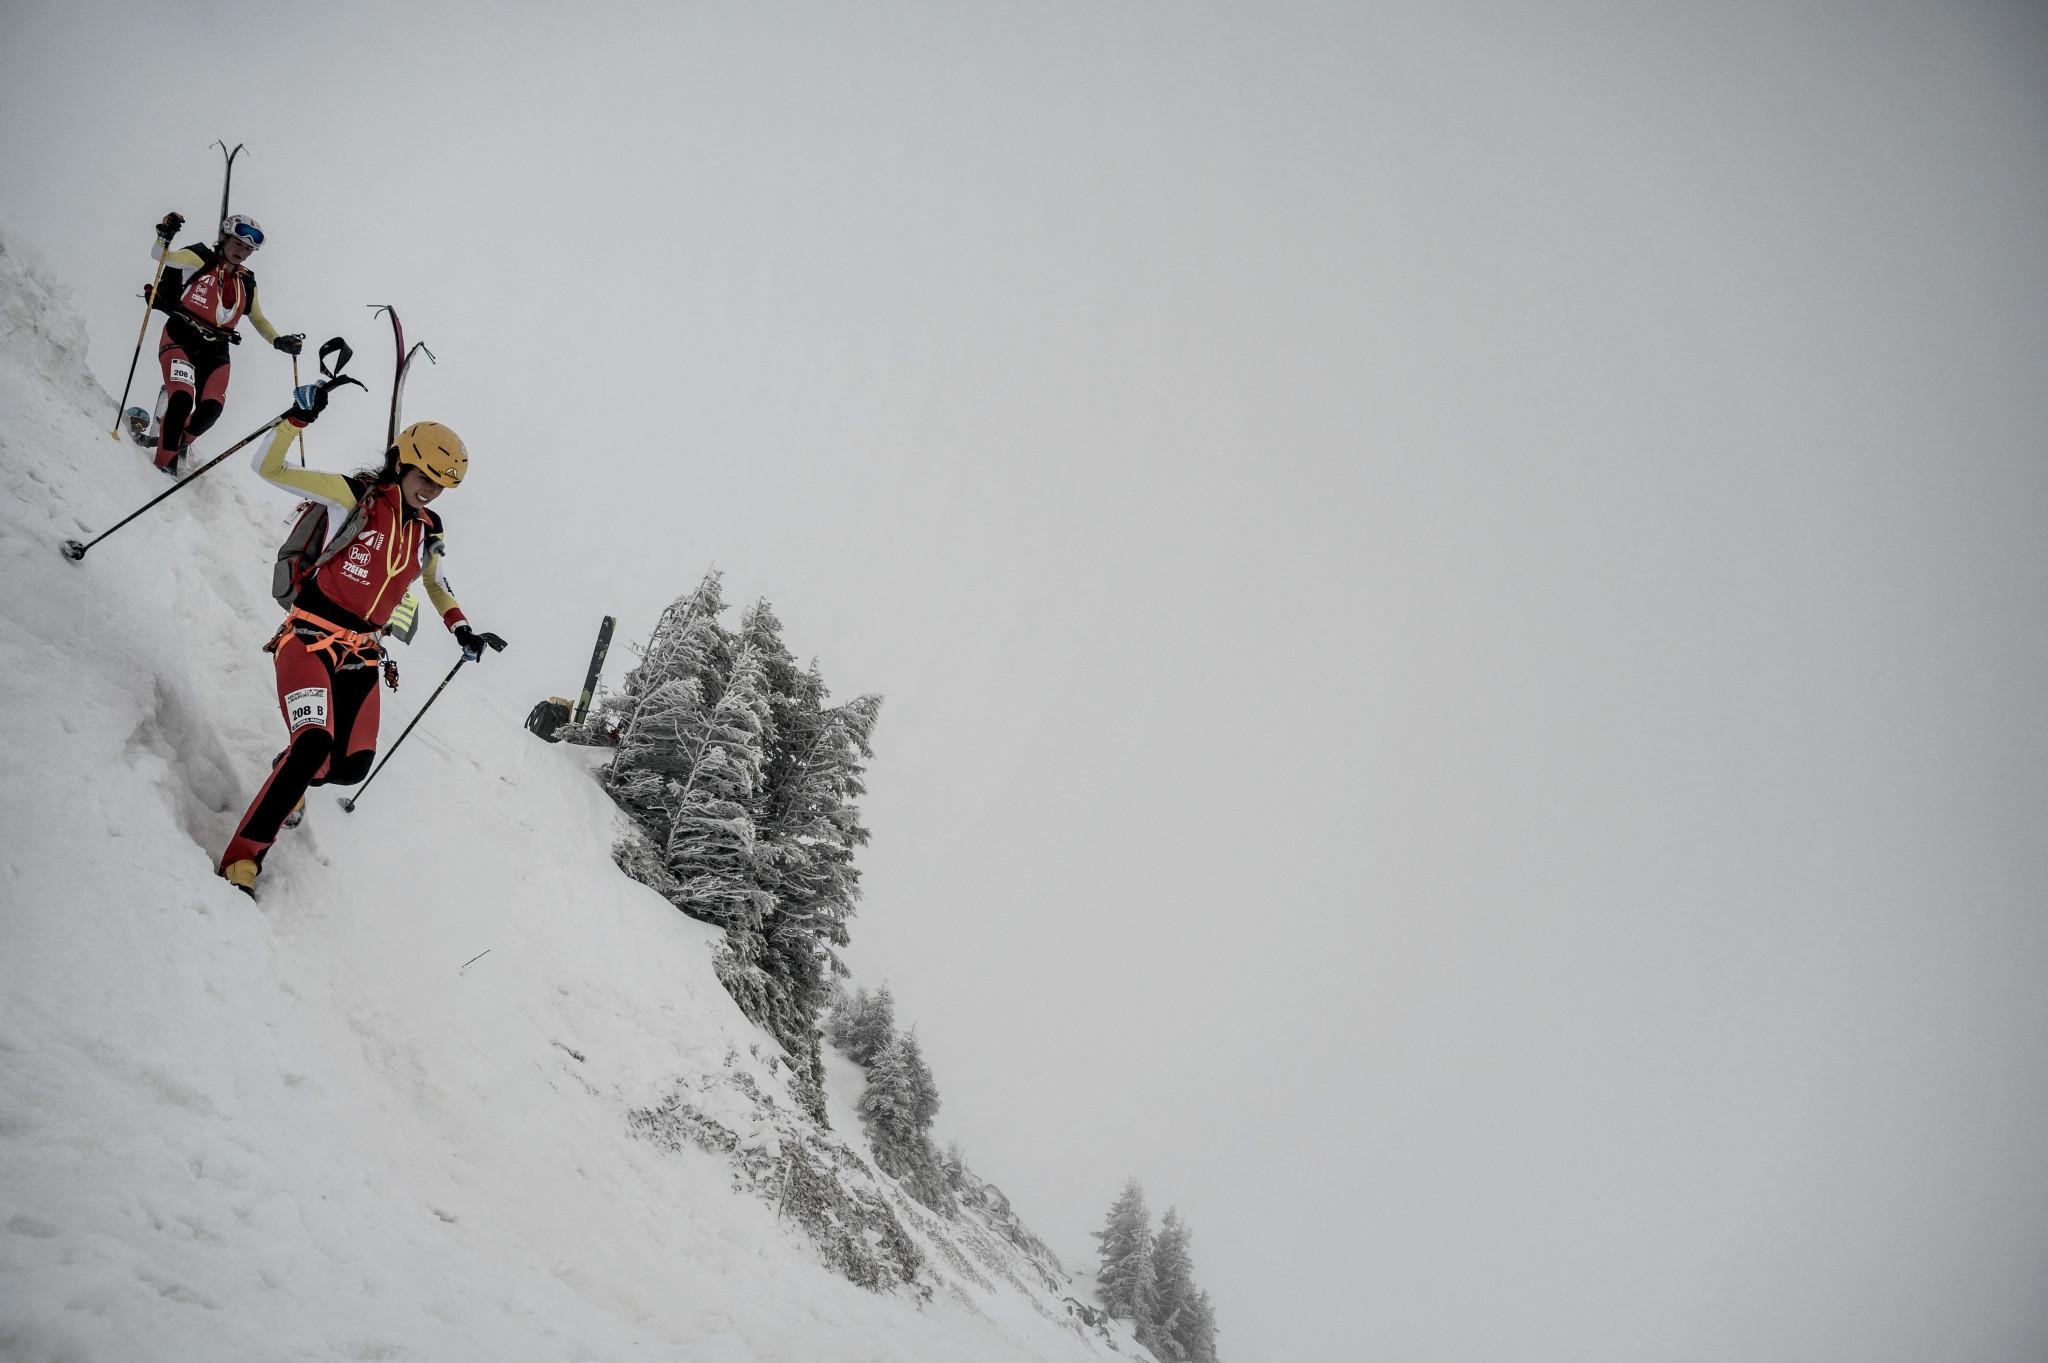 Canals Fontan elected as International Ski Mountaineering Federation Bureau general secretary